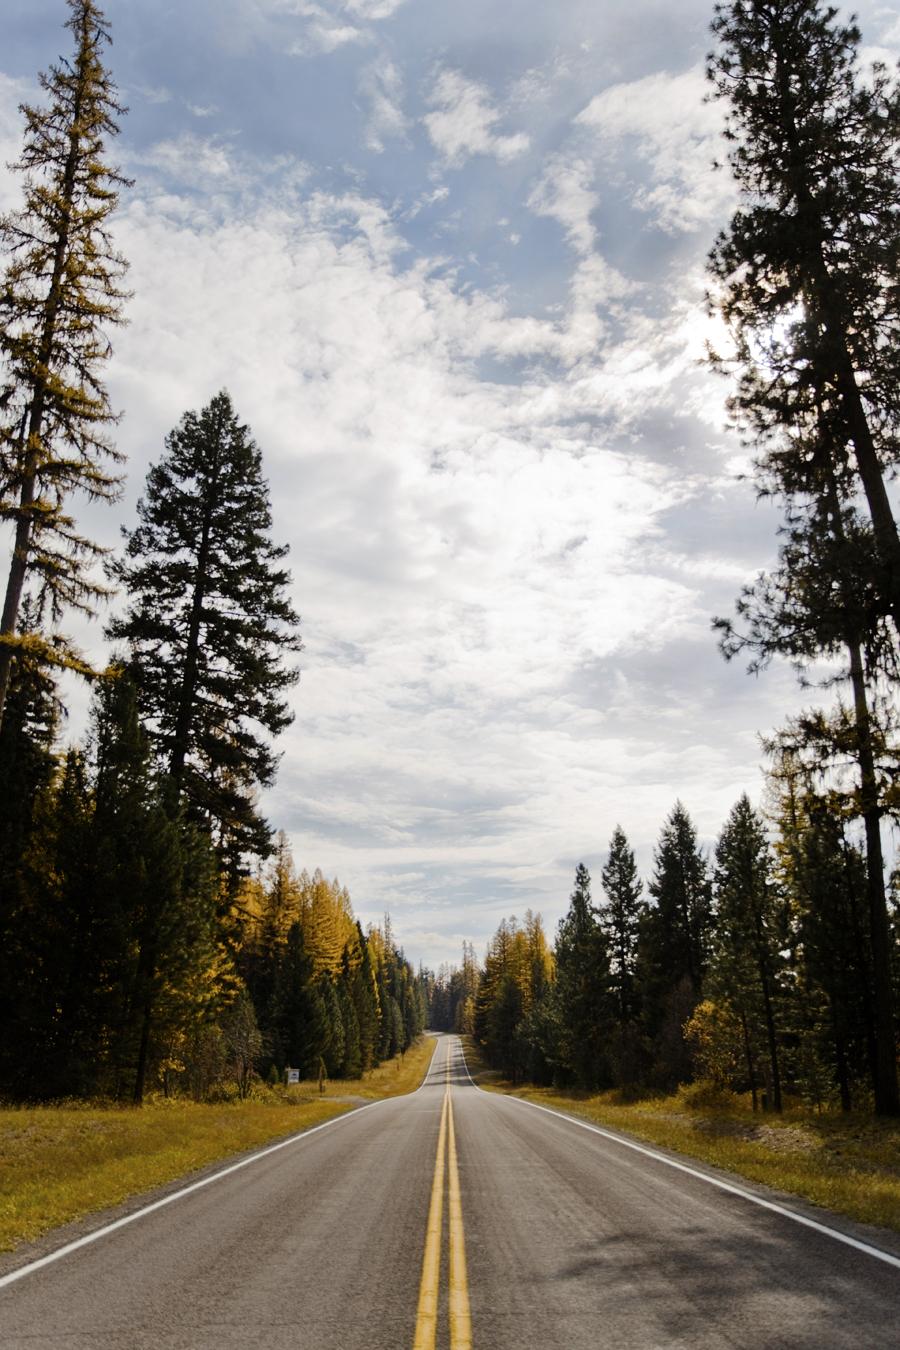 roadtrip_celinemarks_ny_montana2015_154